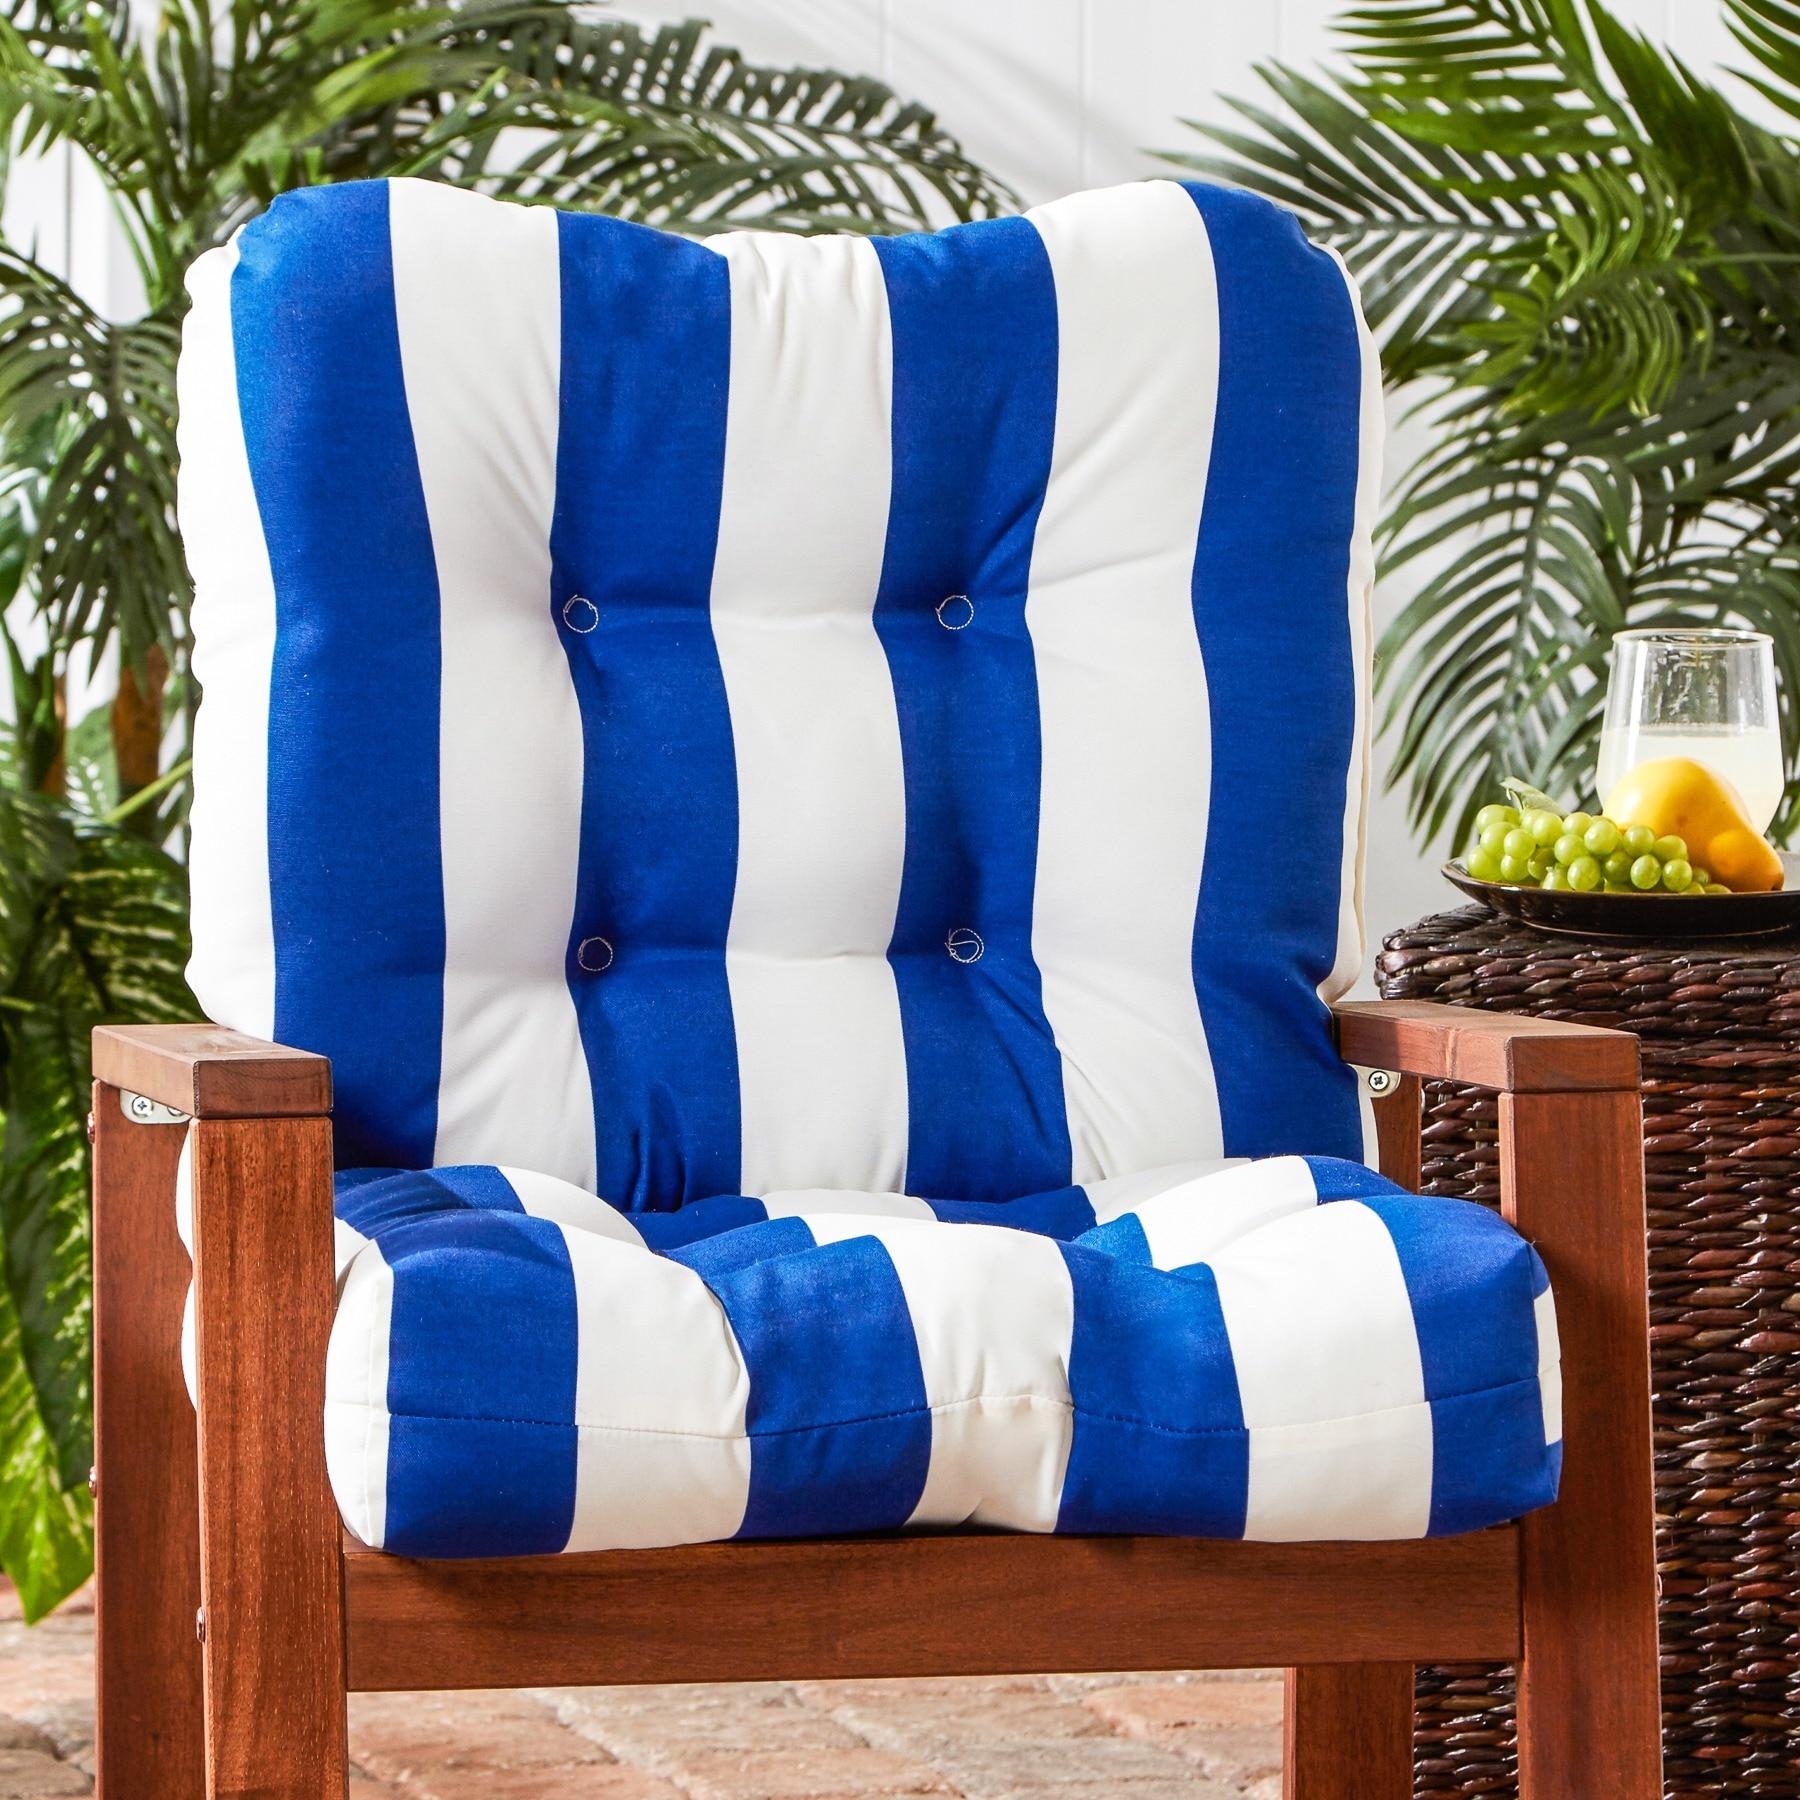 Shop Outdoor Cabana Stripe Overstuffed Chair Cushion Free Shipping